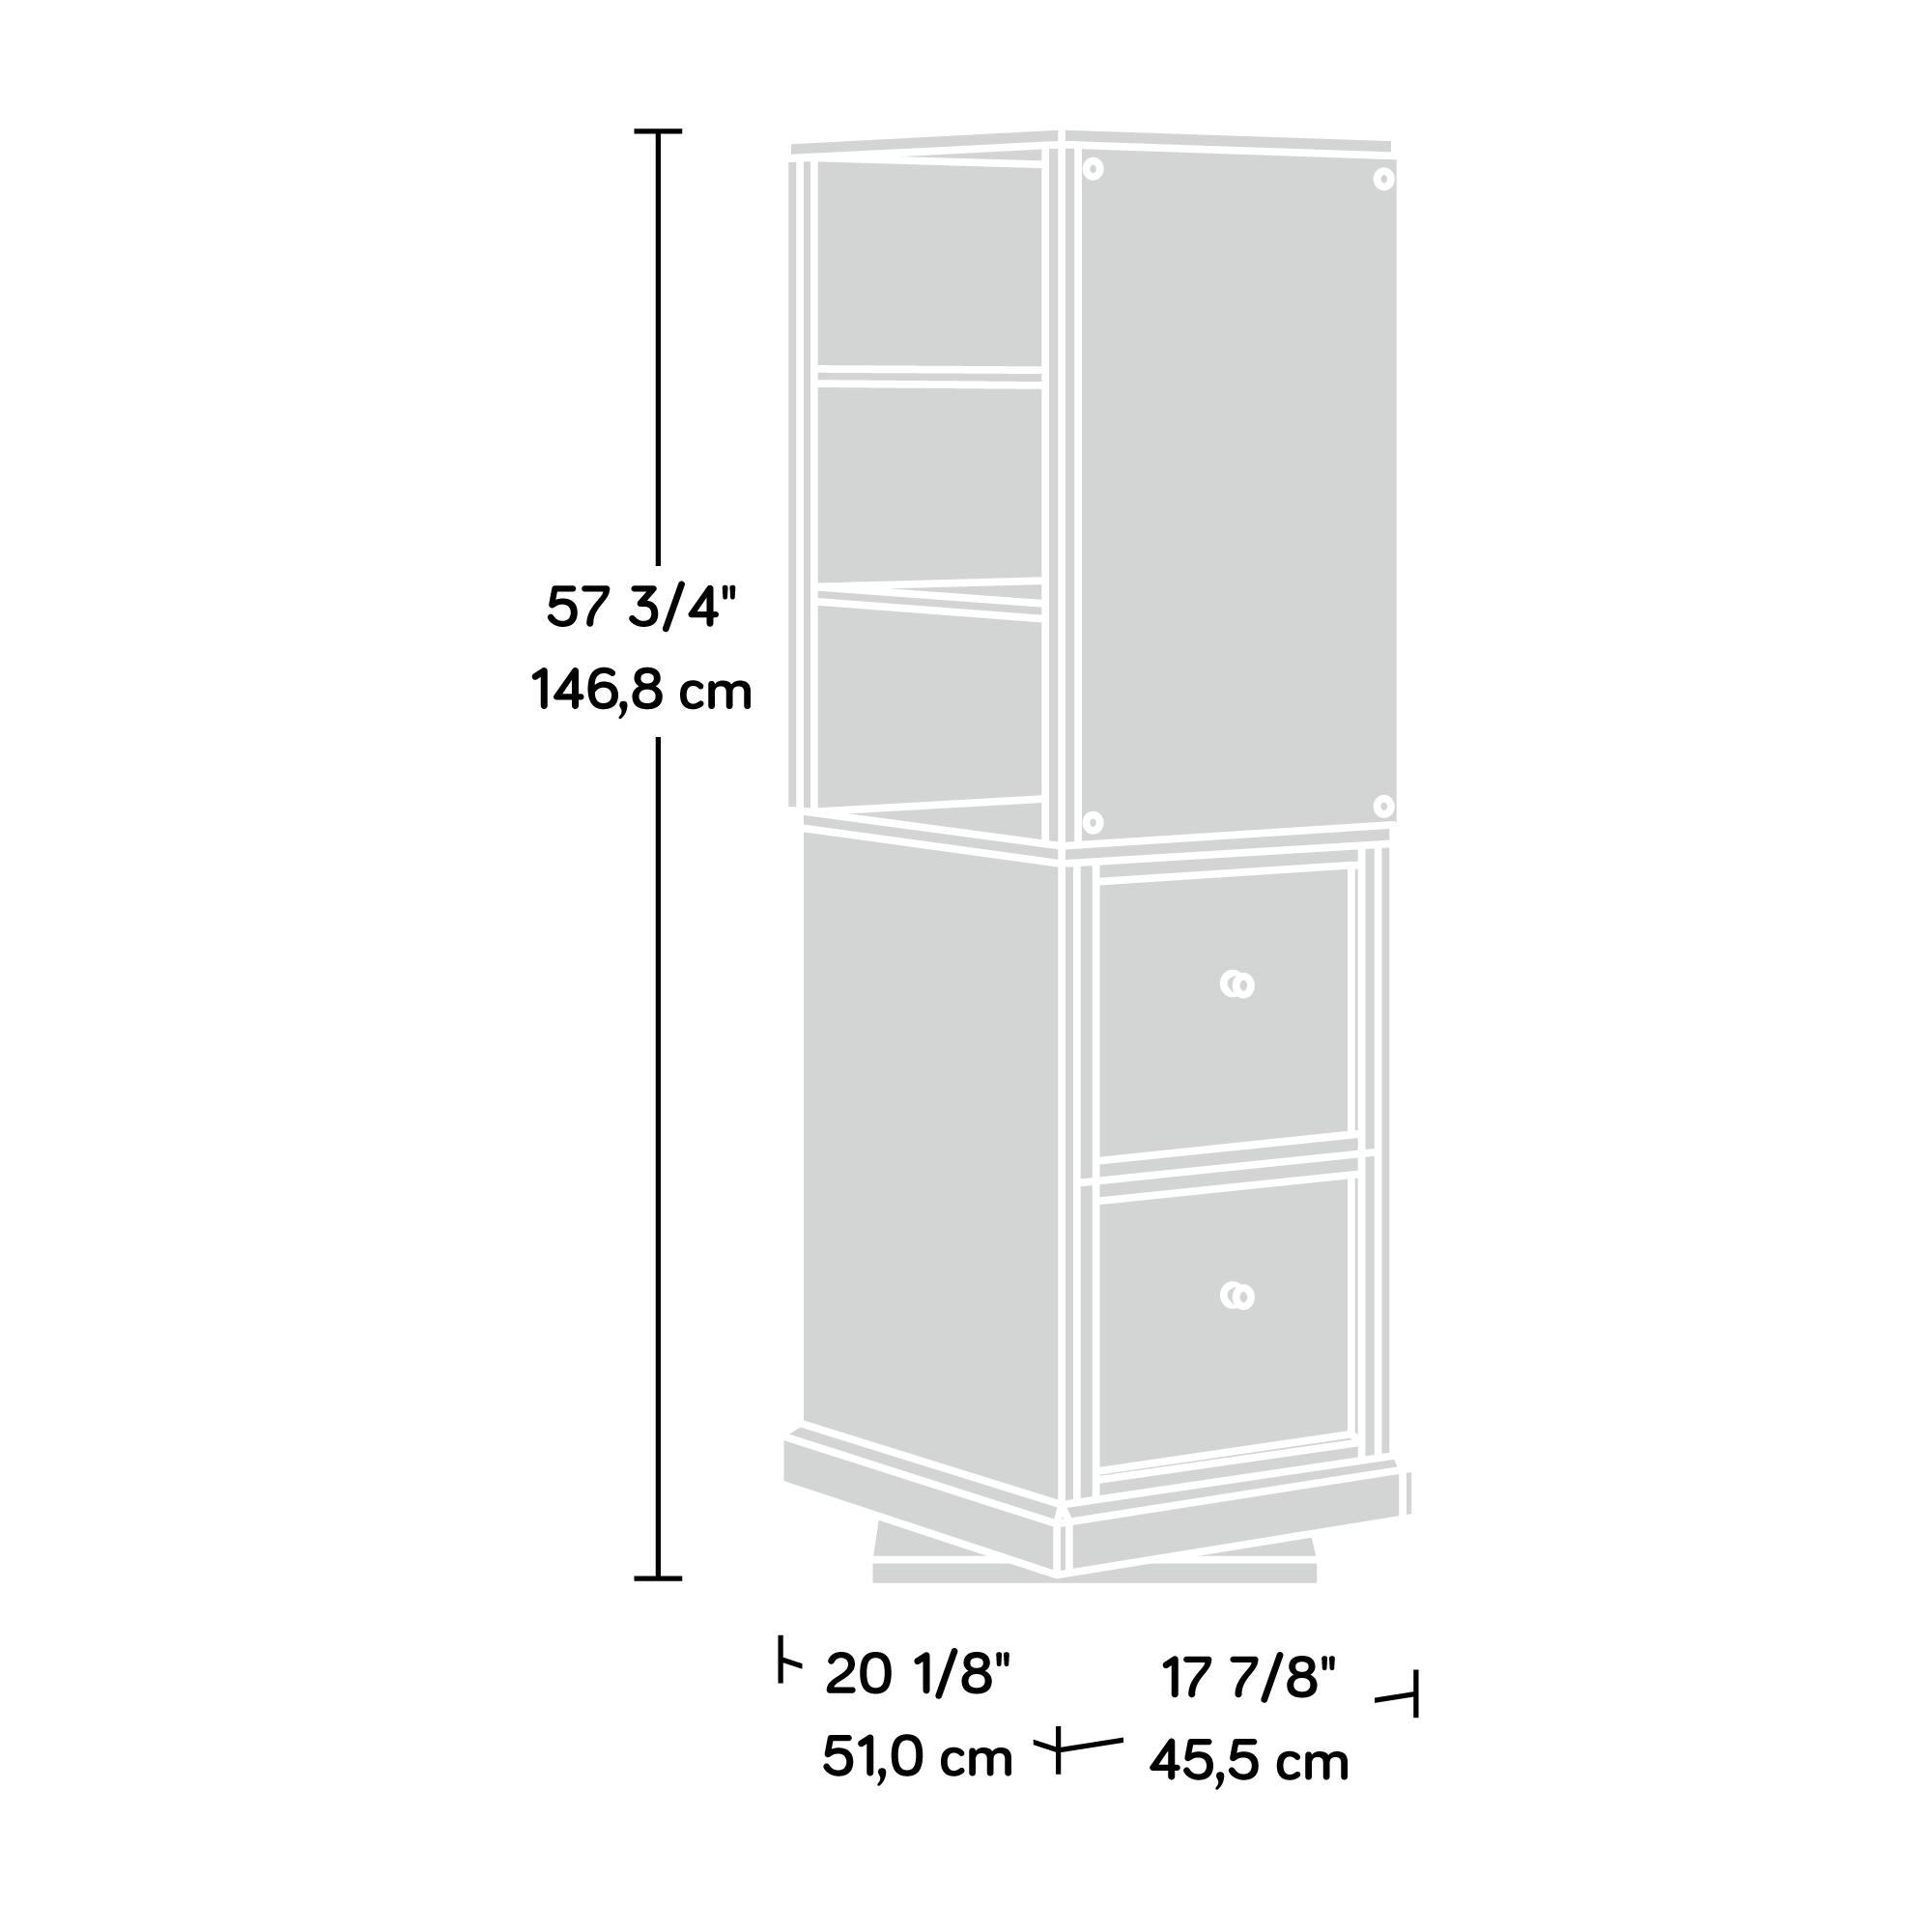 66862d7b3ffb30aa380f4e3b493f466c - Better Homes & Gardens Craftform Craft Tower